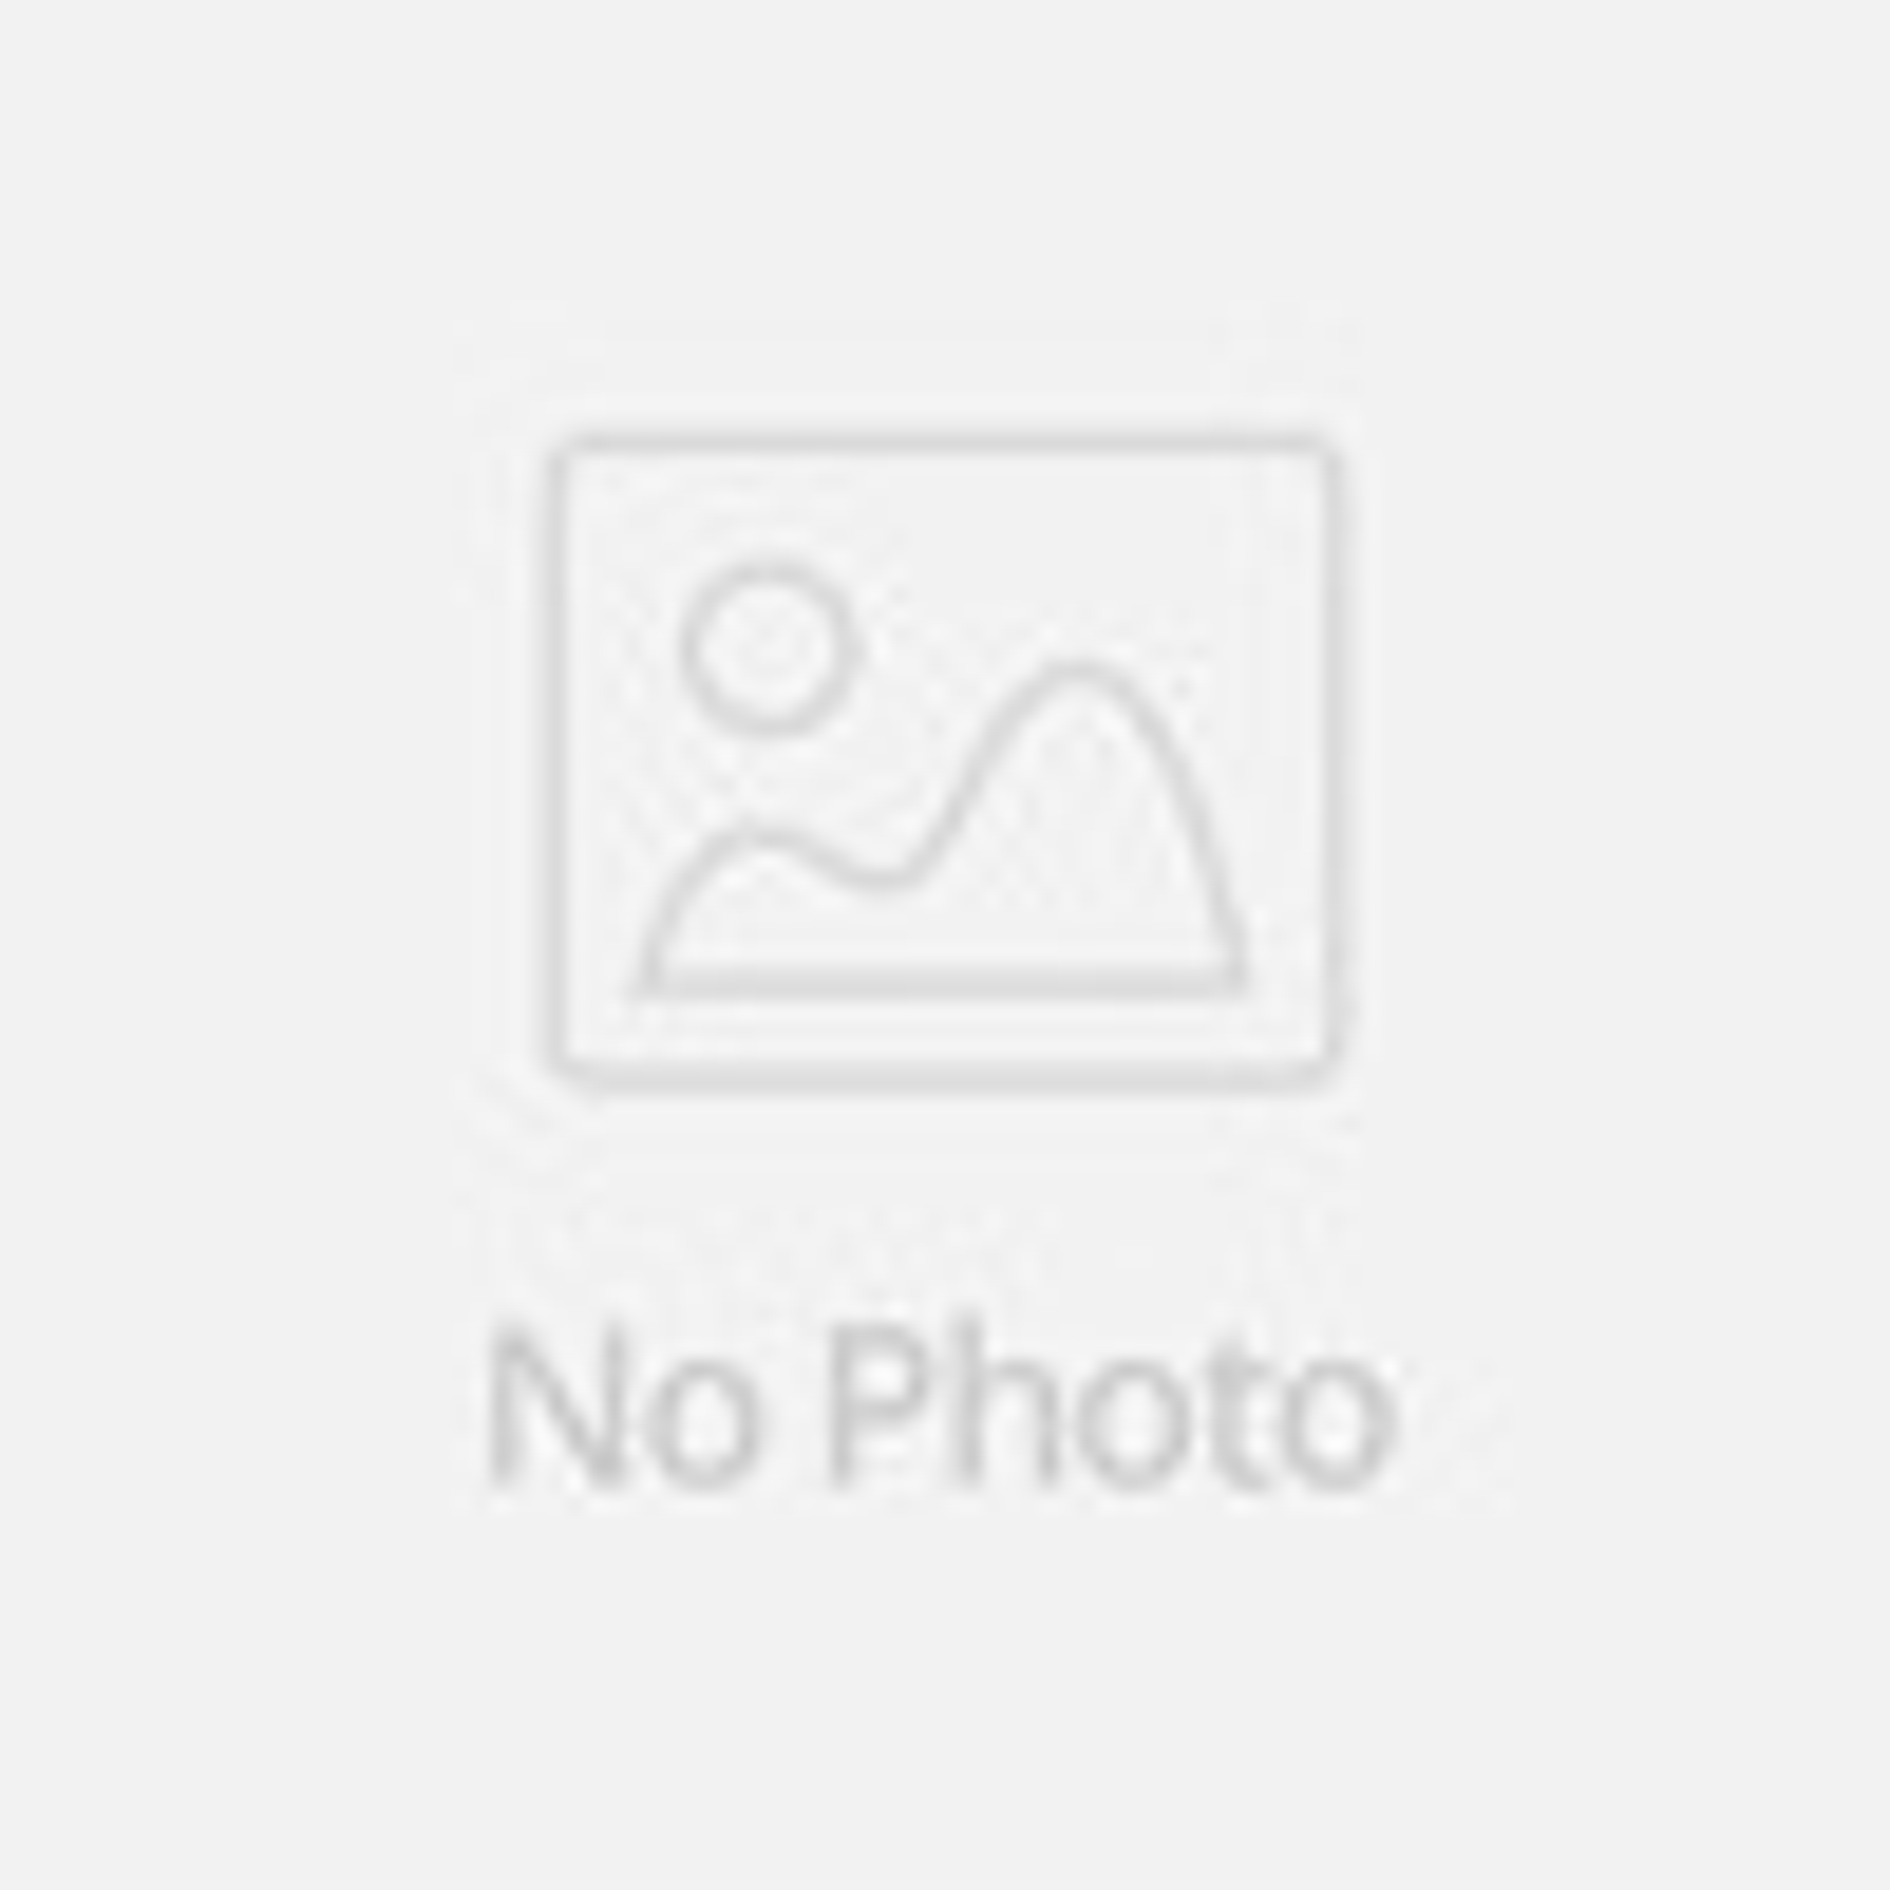 fanless pc Intel N270 Atom Mini thin client L-18 1GB RAM 128GB SSD Support youtube video chat, videos(China (Mainland))